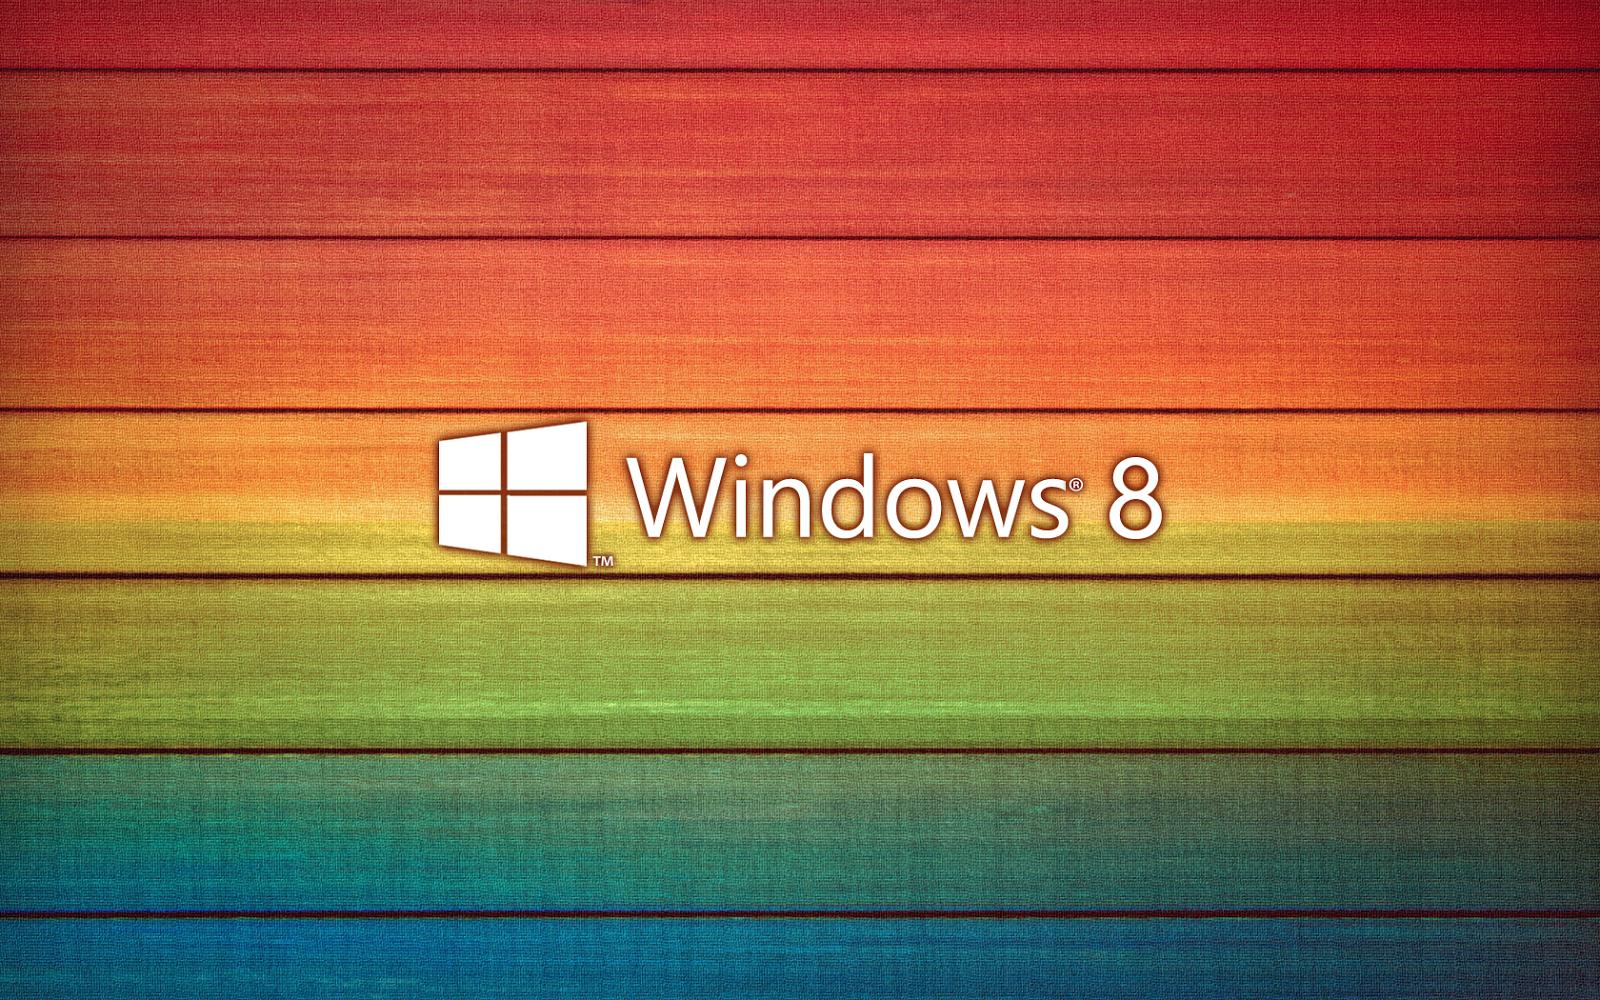 ... Admin MaulaShare akan Share tentang mempercepat kinerja di Windows 8